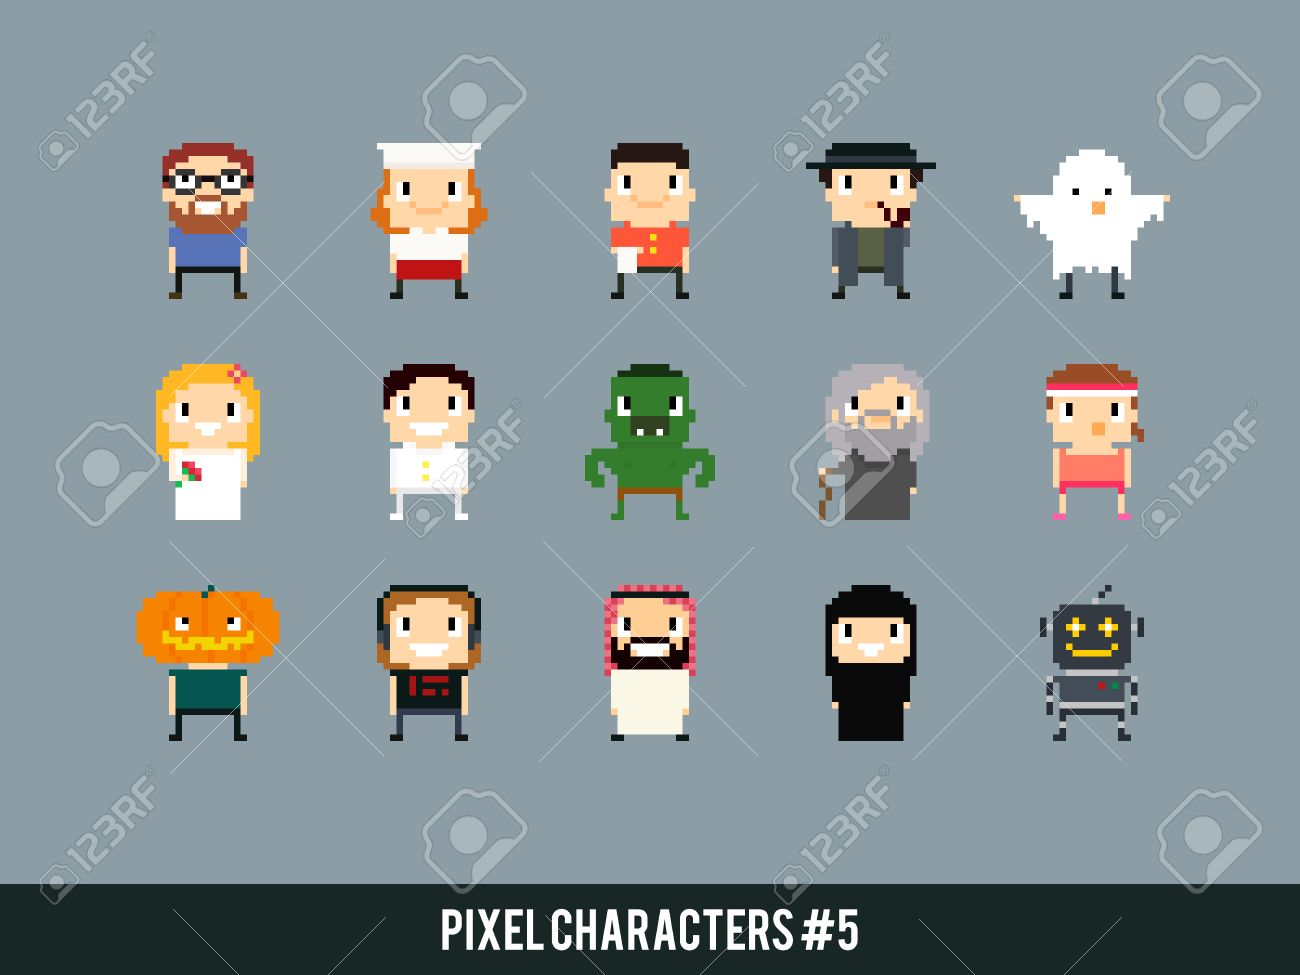 Diferentes Personajes Pixel Art: Cocinero, Camarero, Fantasma, Novia ...